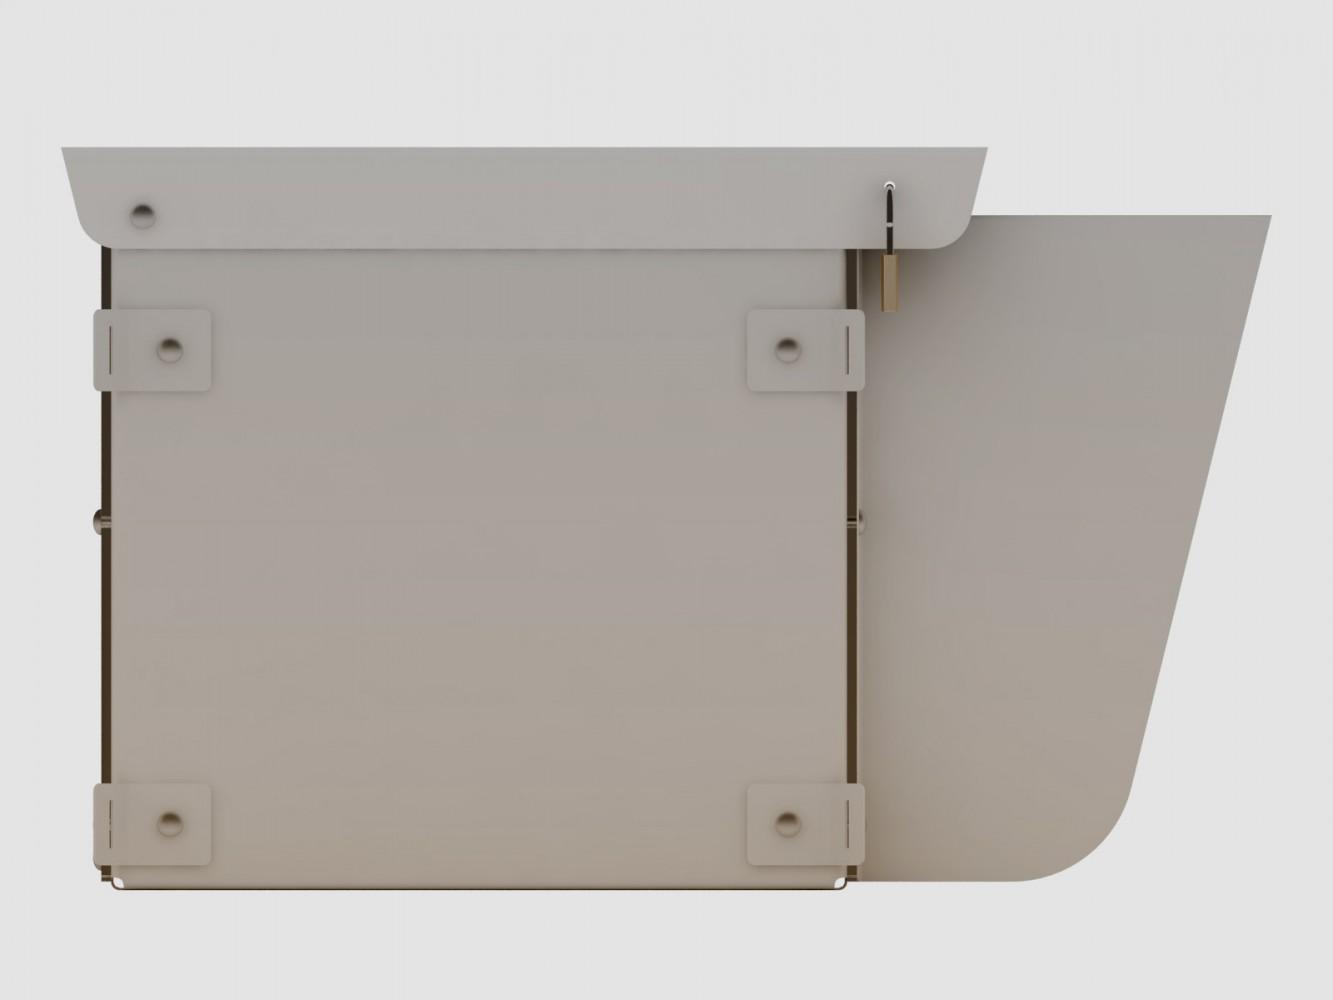 Lraum-Kamerabox-2